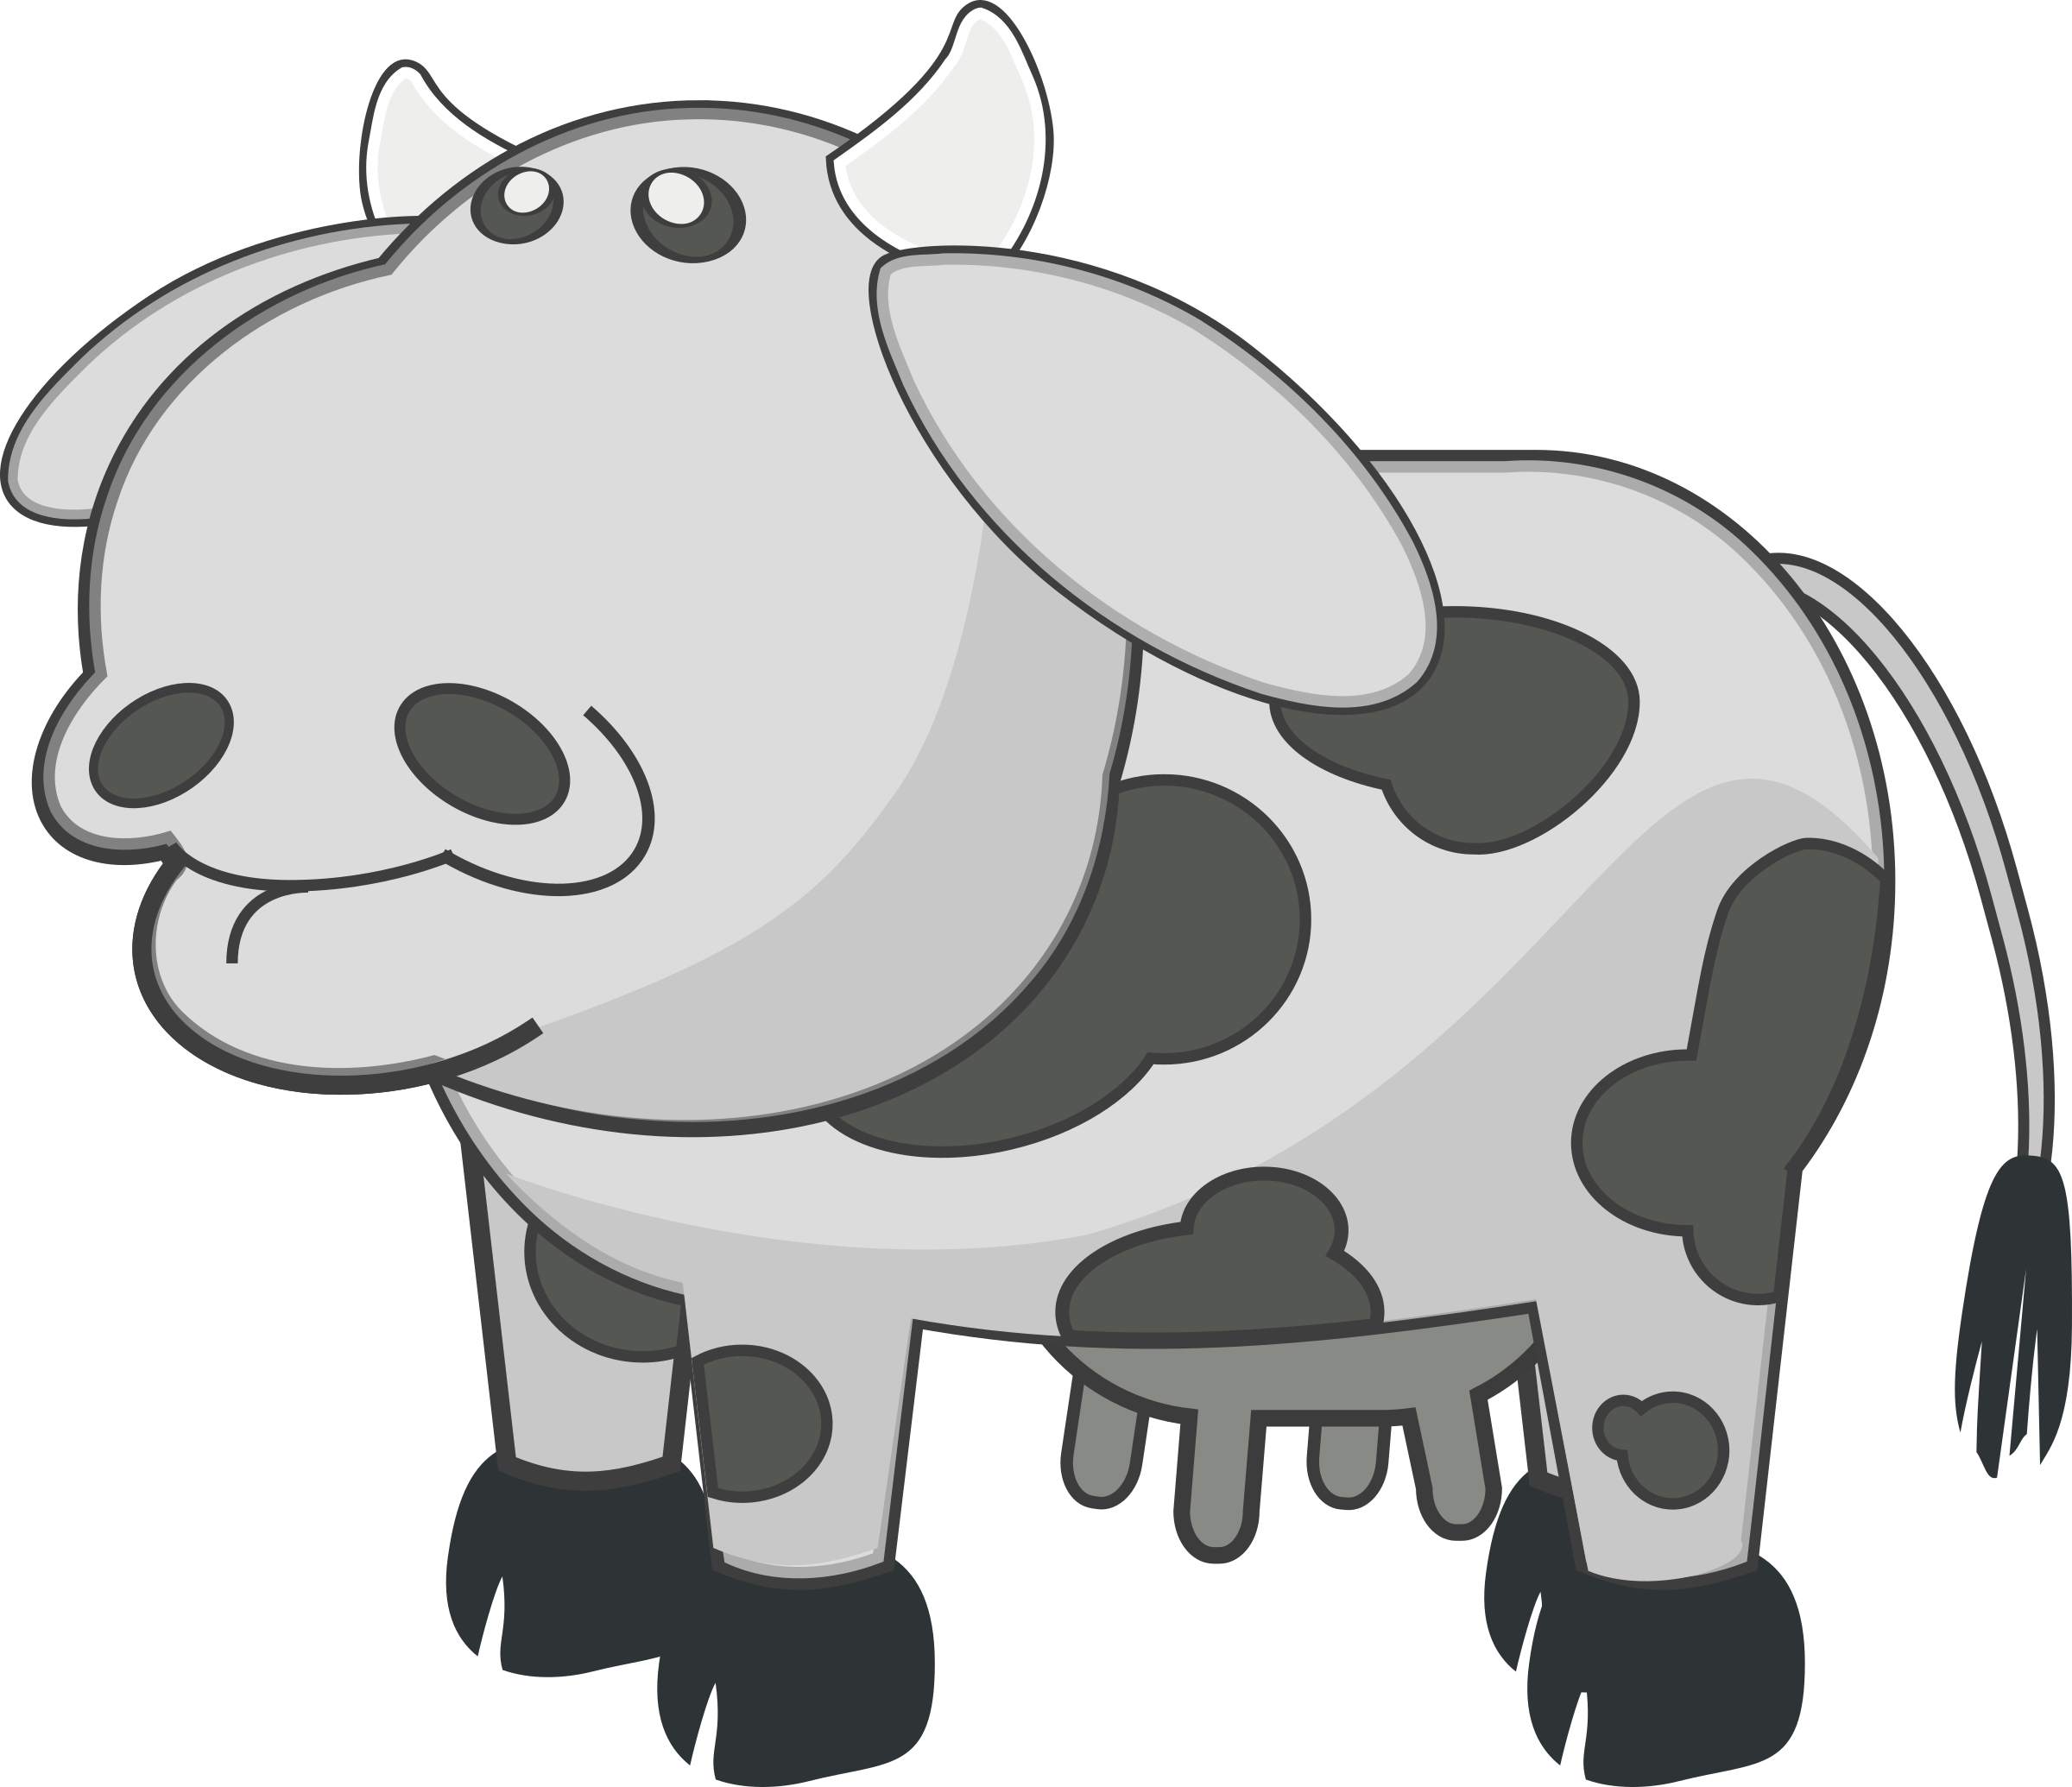 Cows clipart cute. Gray cow big image